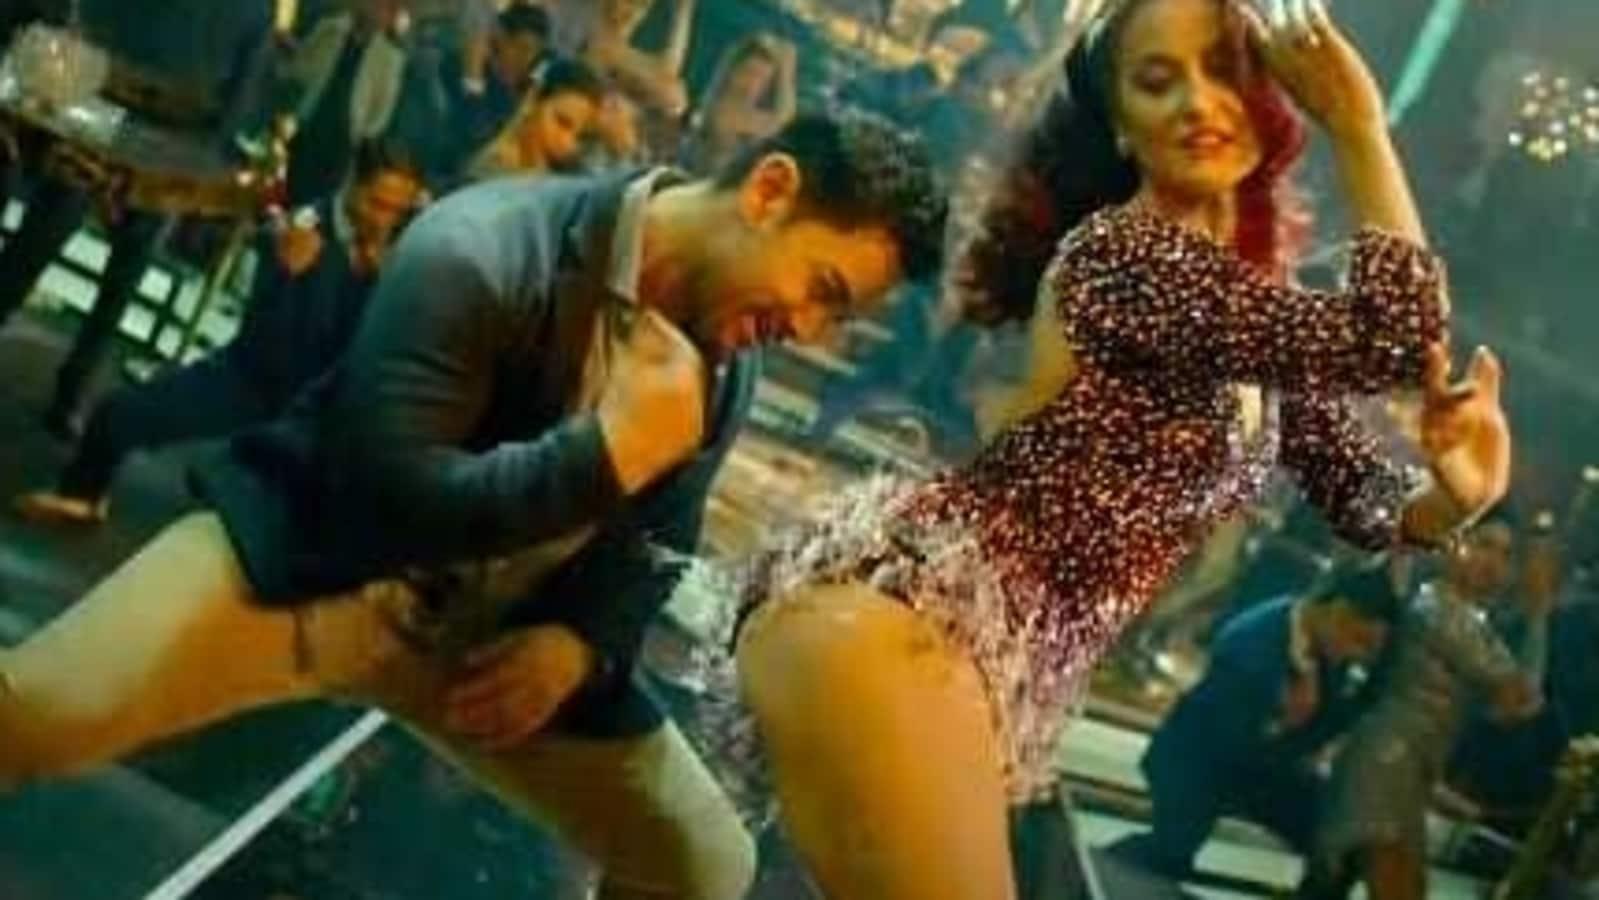 Pipe-smoking Aamir Khan goes clubbing with Elli AvrRam in Har Funn Maula teaser. Watch here - Hindustan Times